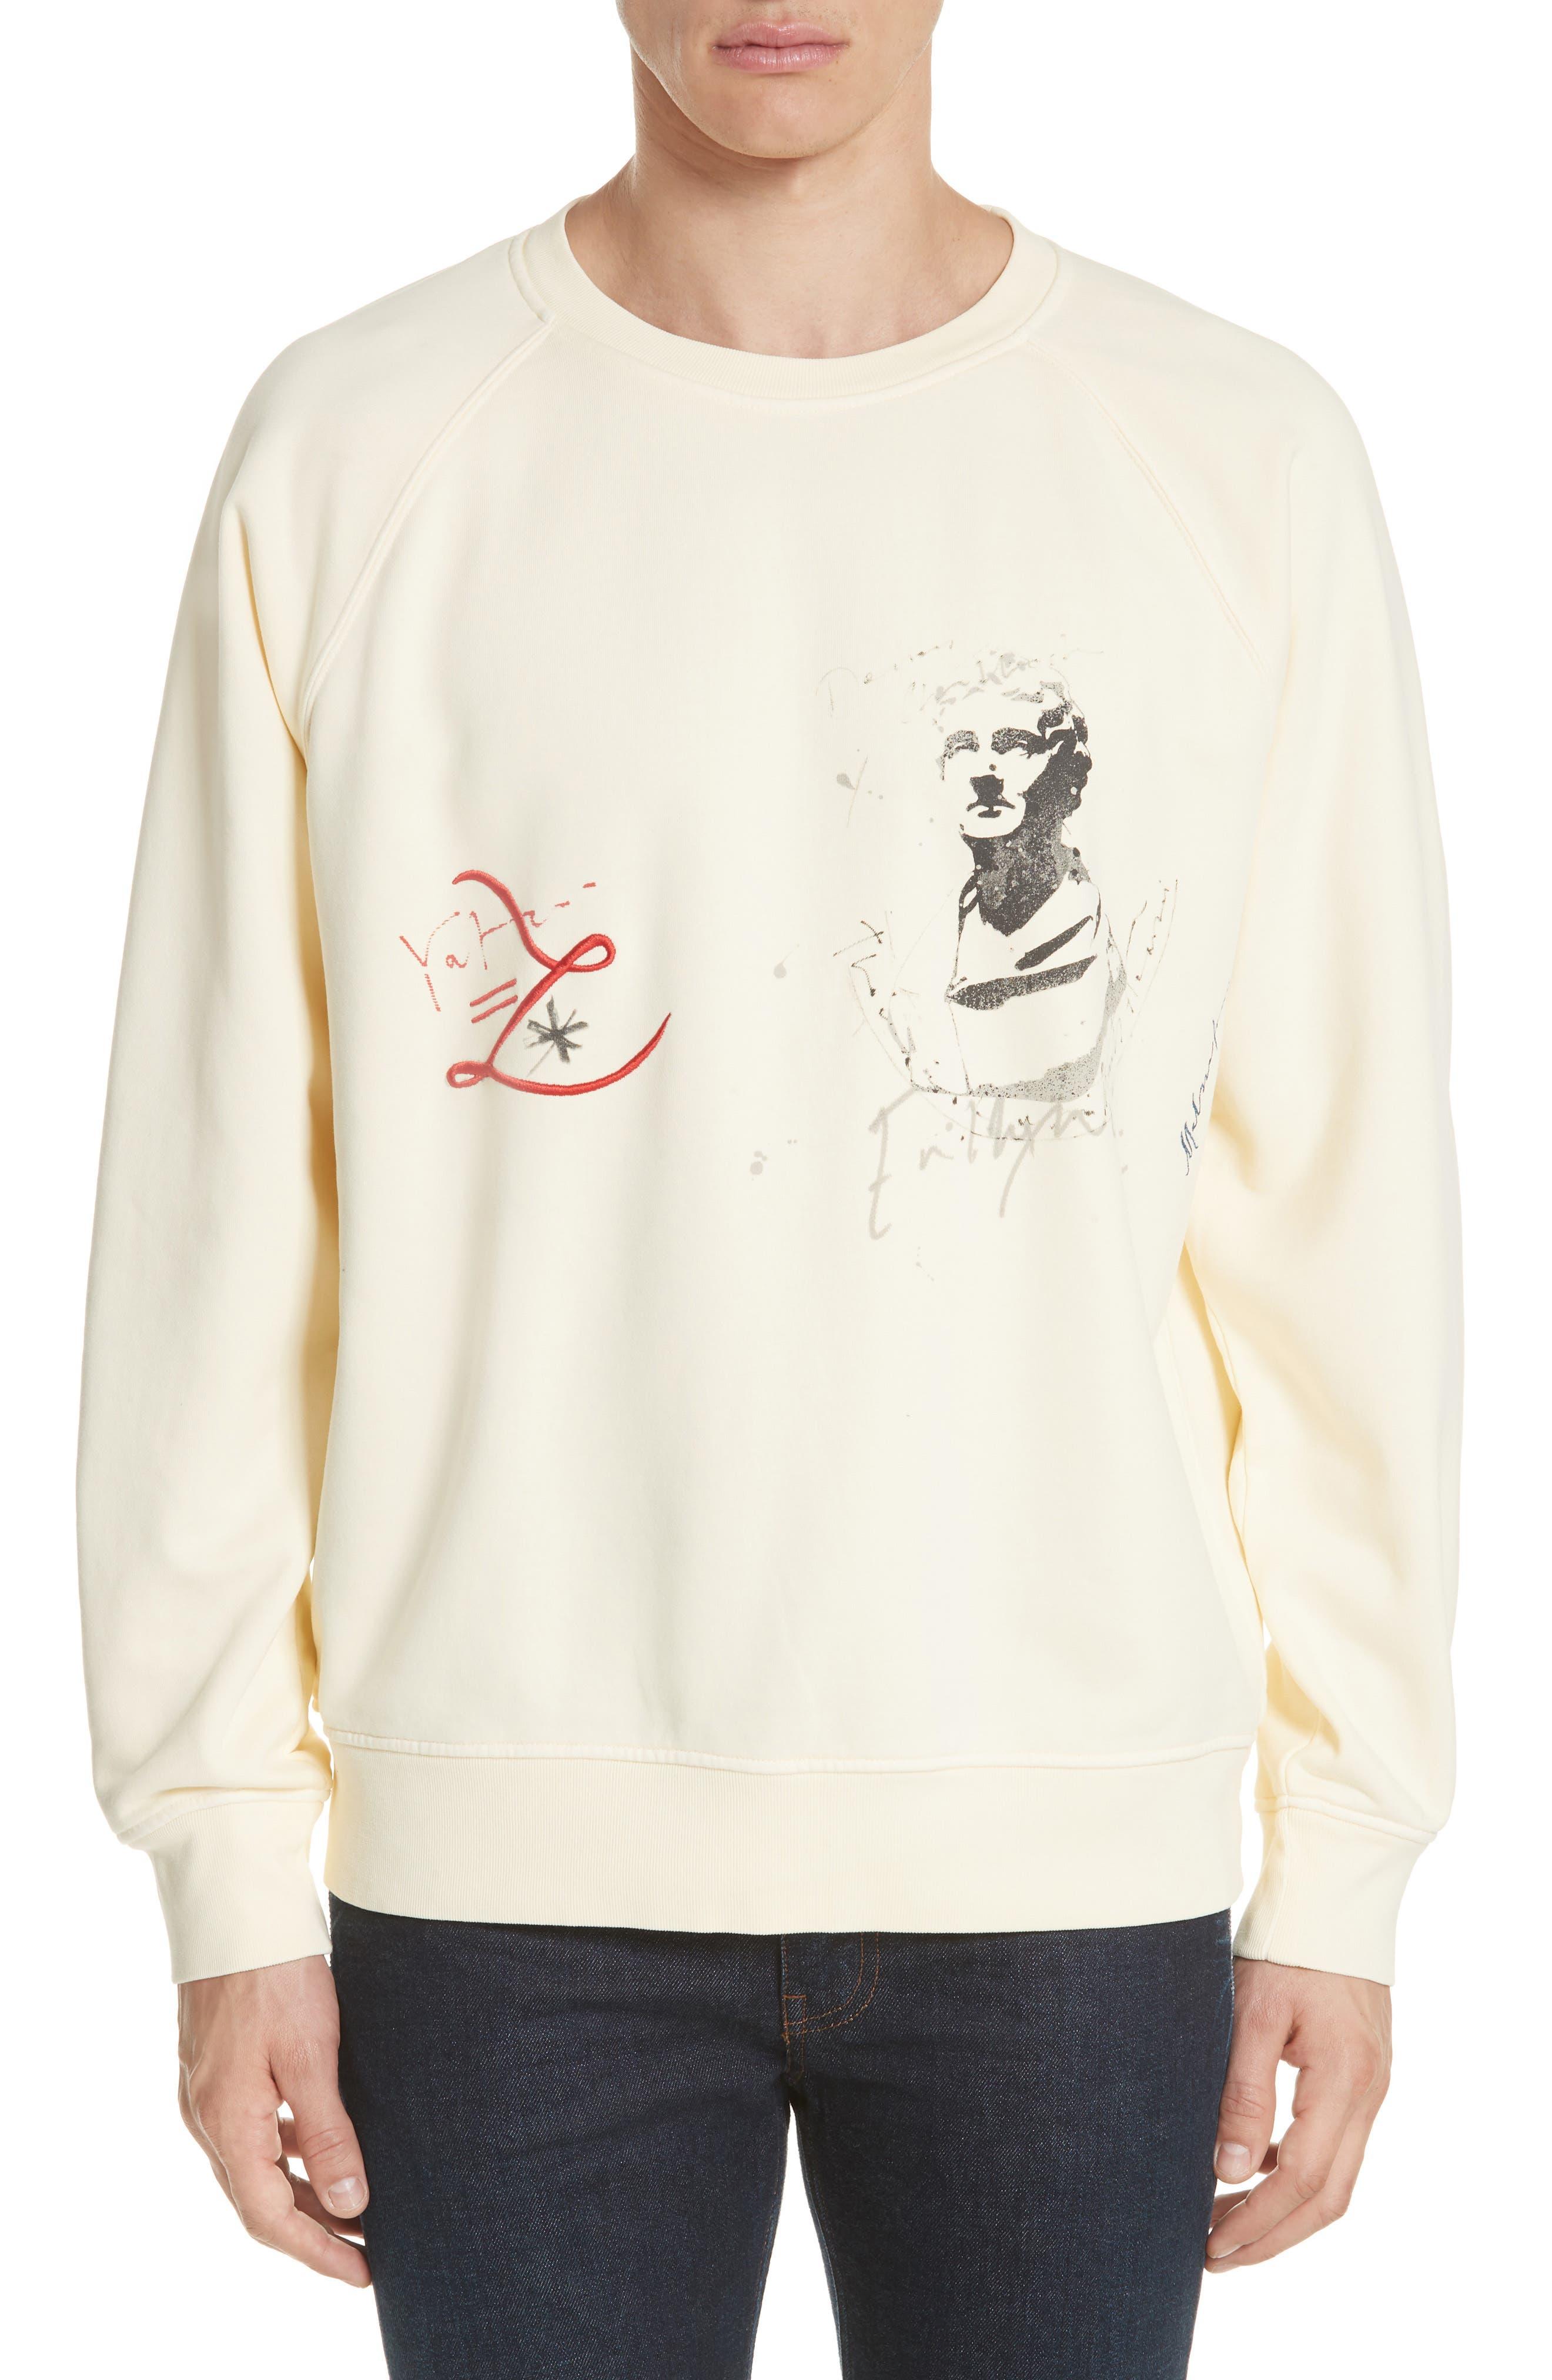 Earlford Graphic Sweatshirt,                         Main,                         color, Pale Yellow